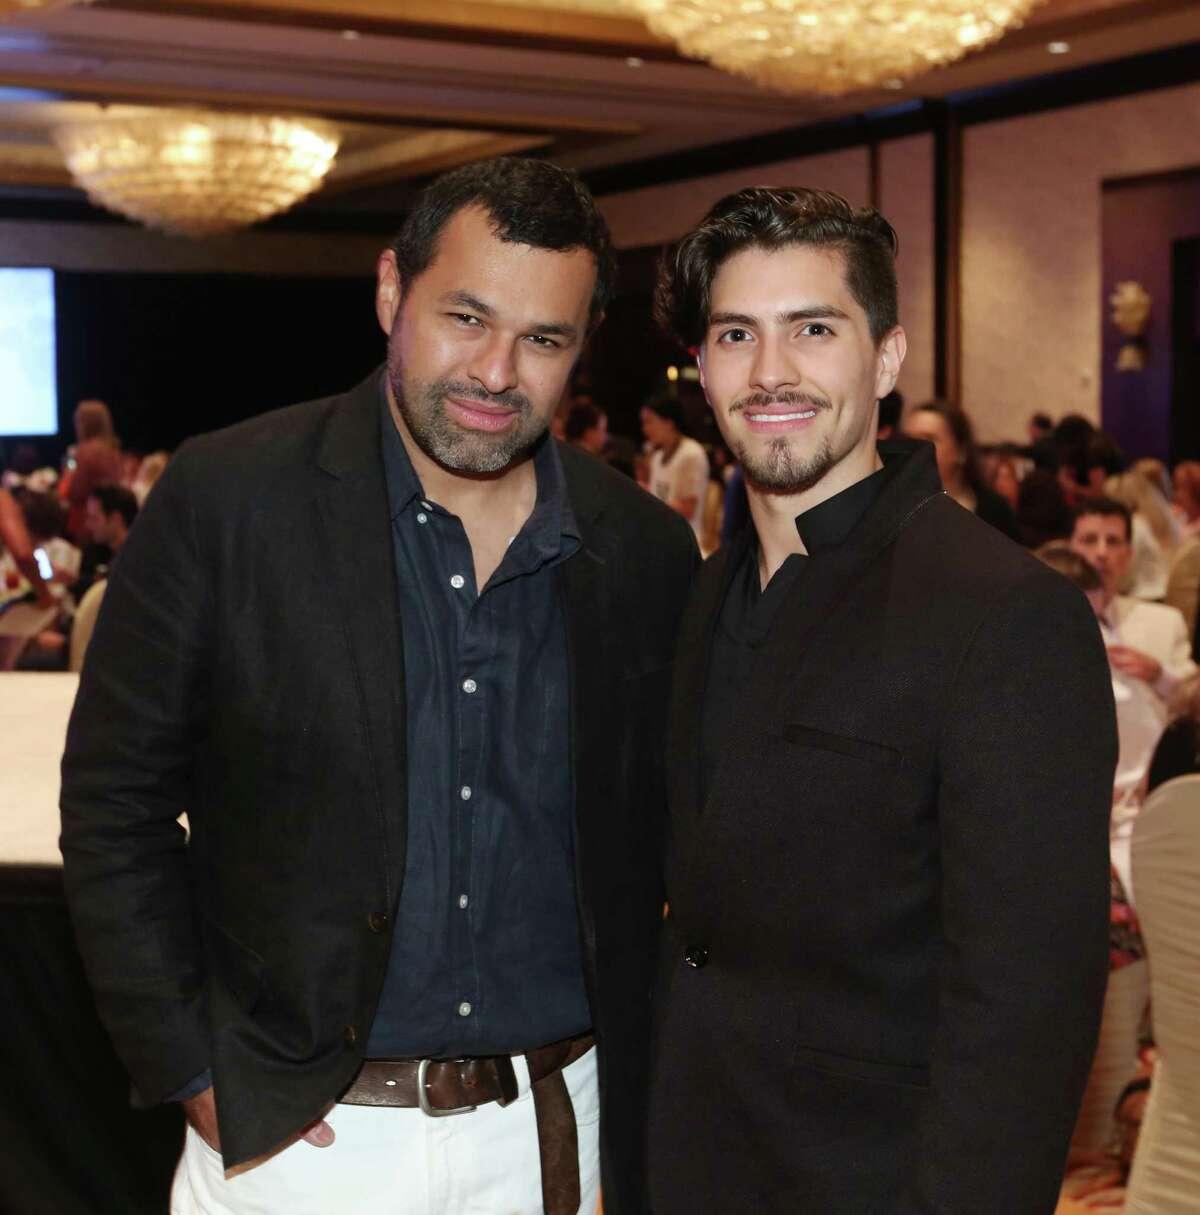 Designer Juan Carlos Obando, left, and Sal Montes